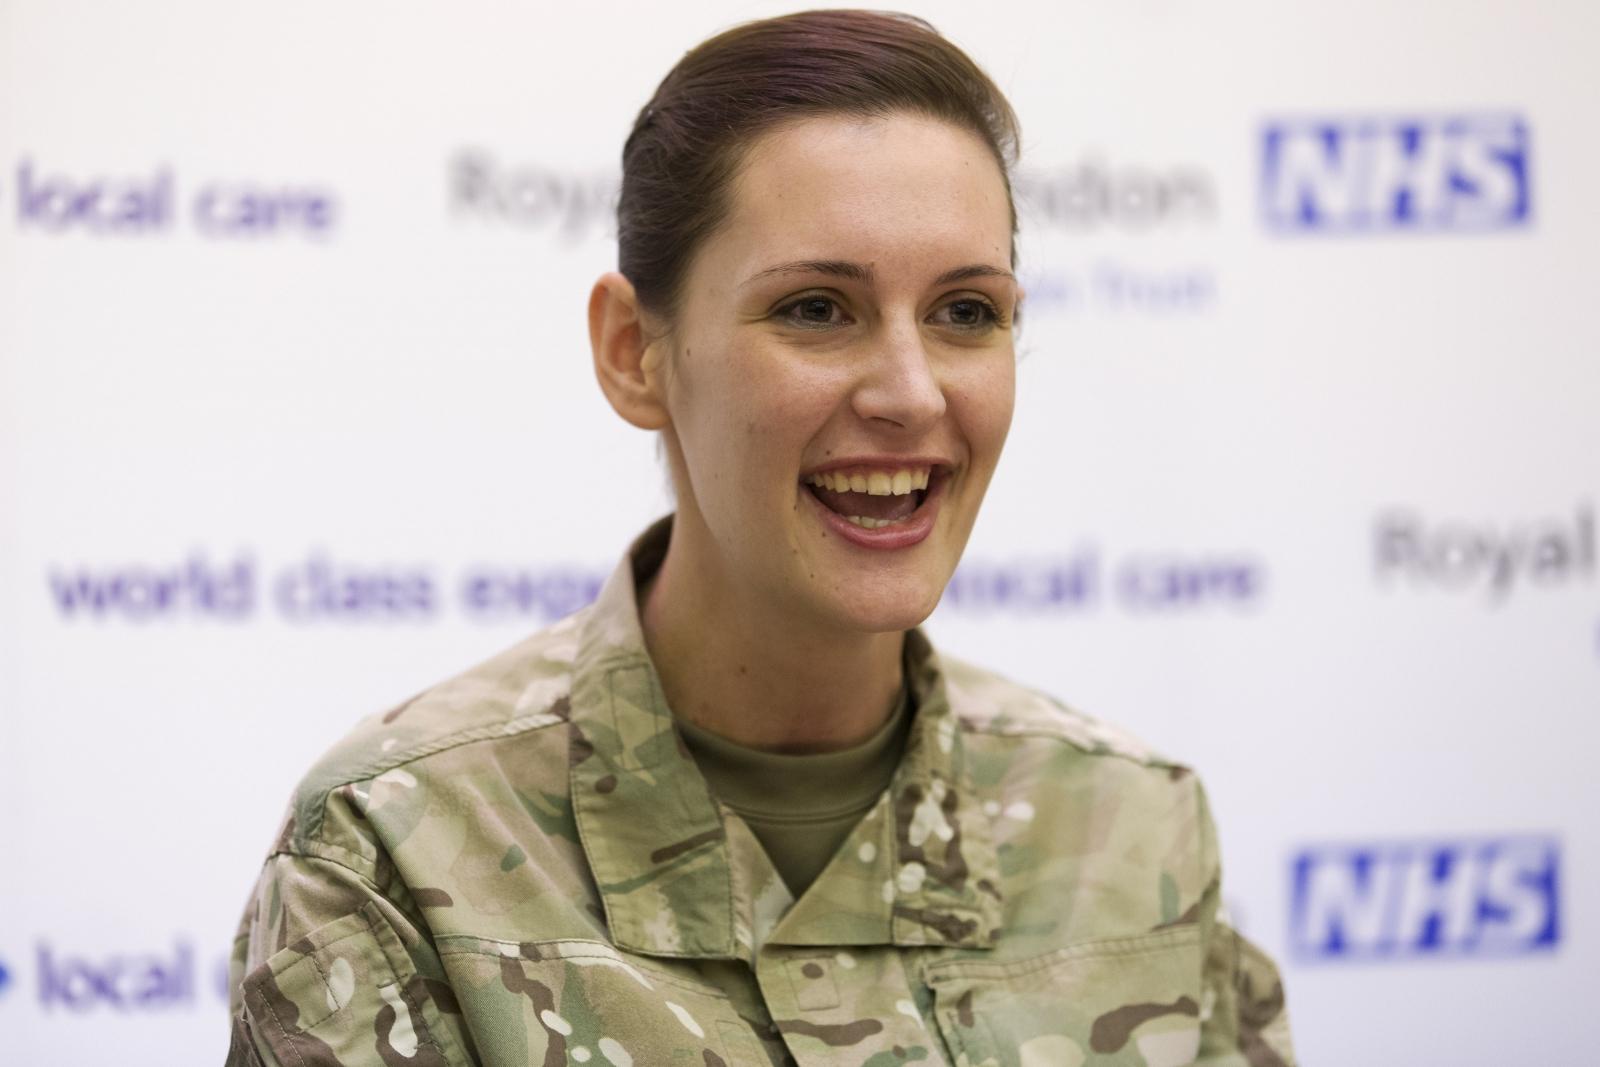 Corporal Anna Cross